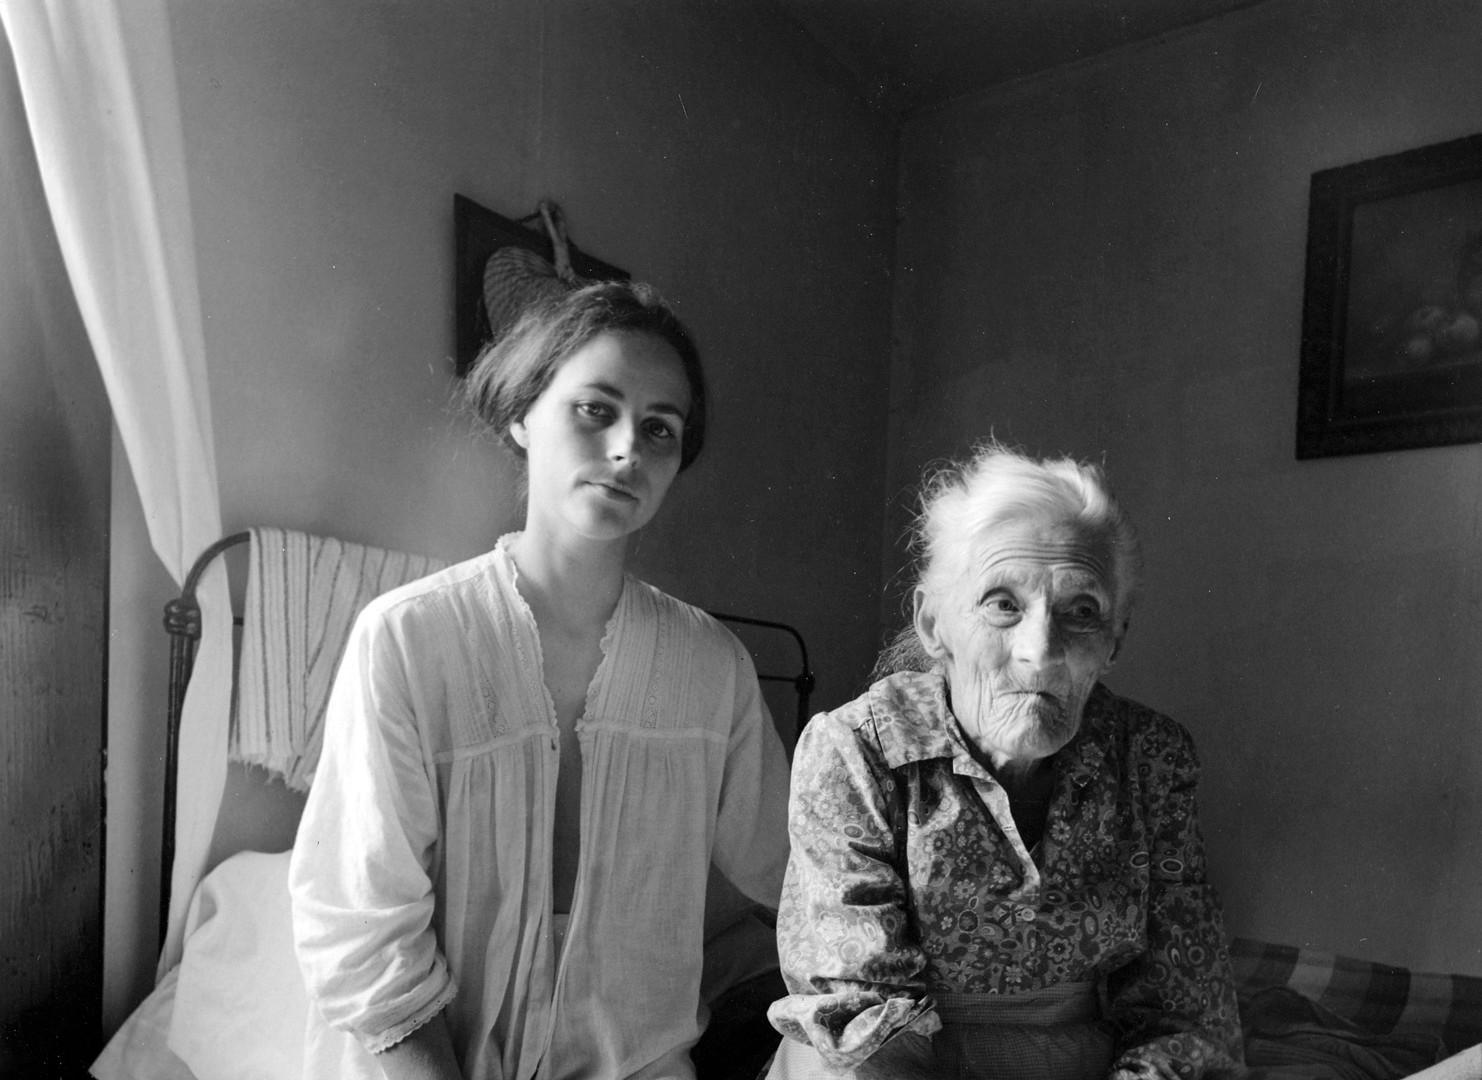 Emmet Gowin, Edith and Rennie Booher, Danville, Virginia, 1970